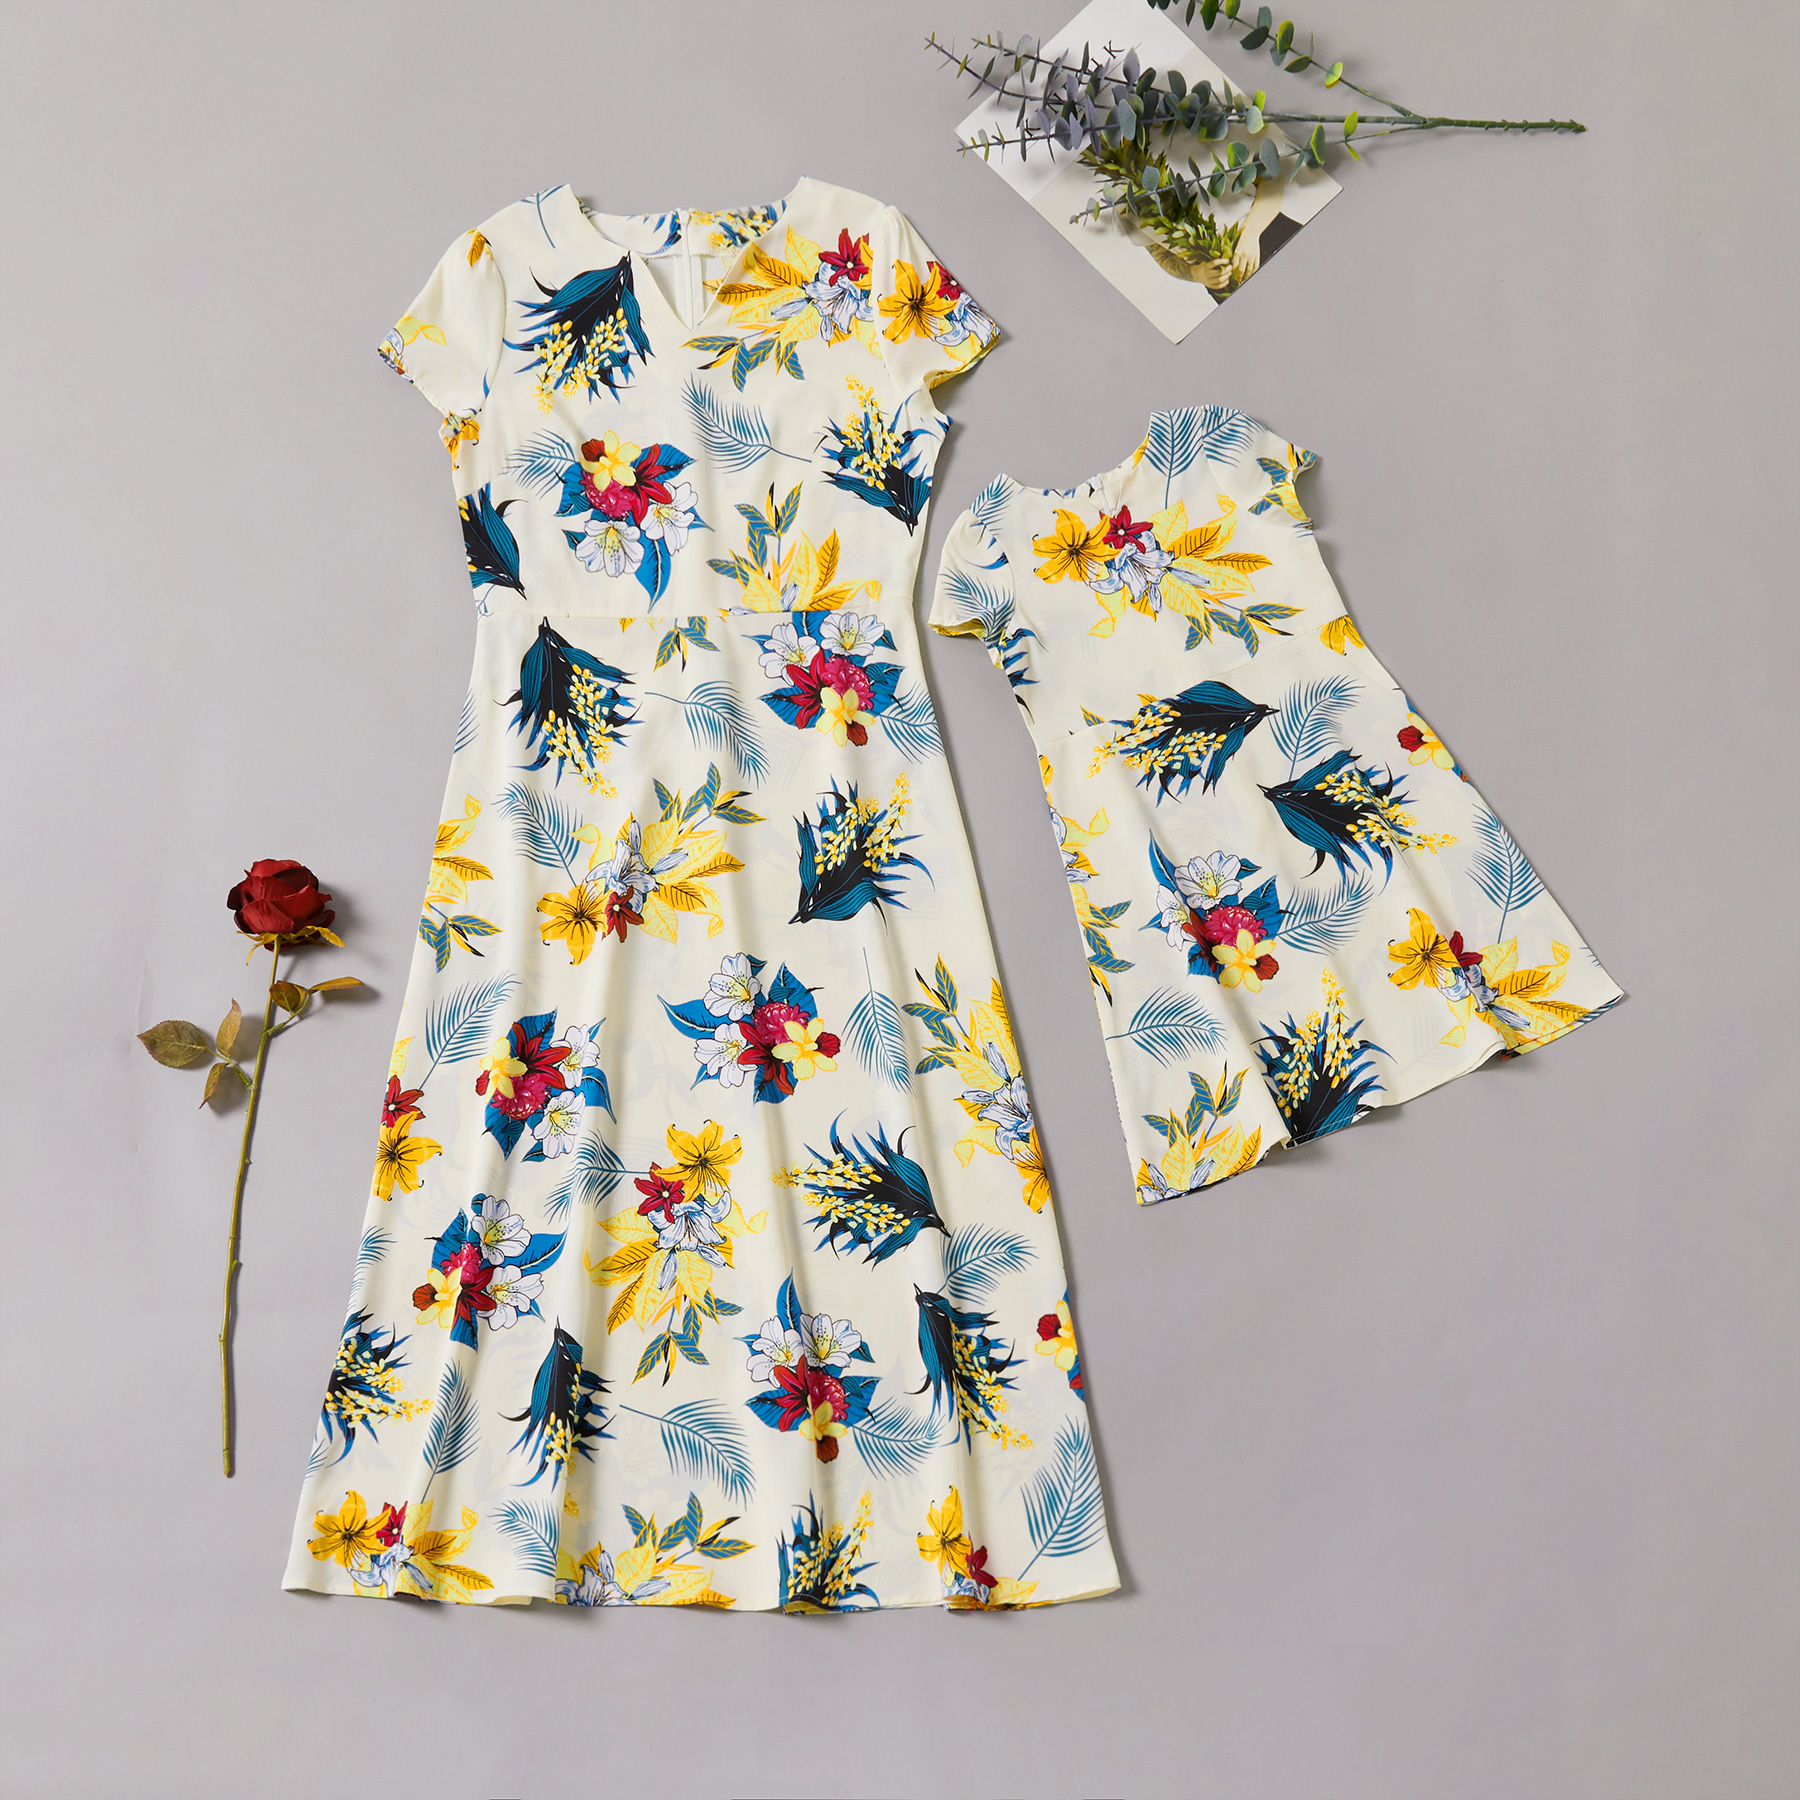 Printed Matching Dresses